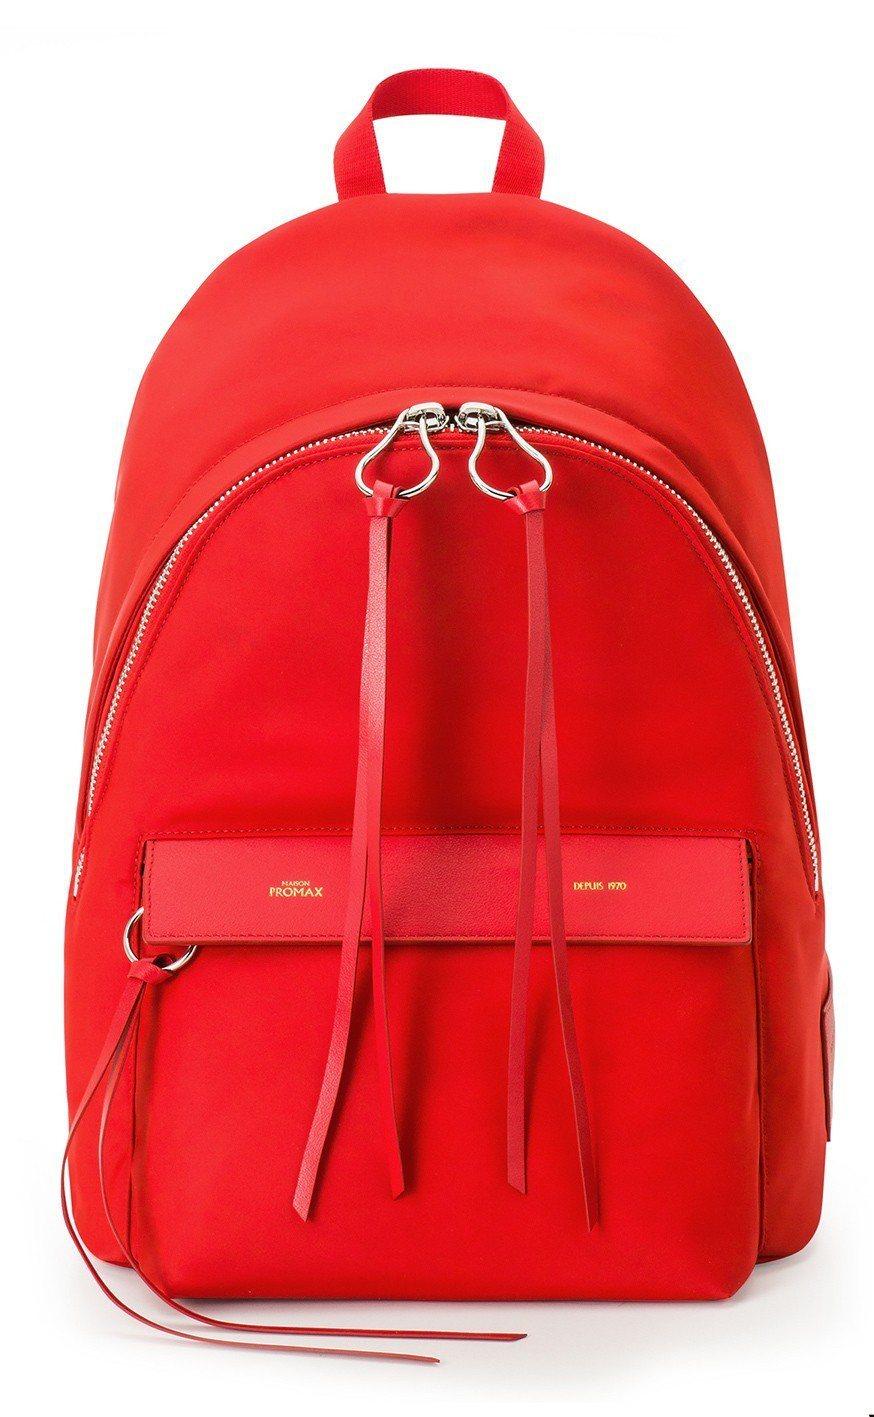 Sac系列後背包,約6,800元。圖/MAISON PROMAX提供